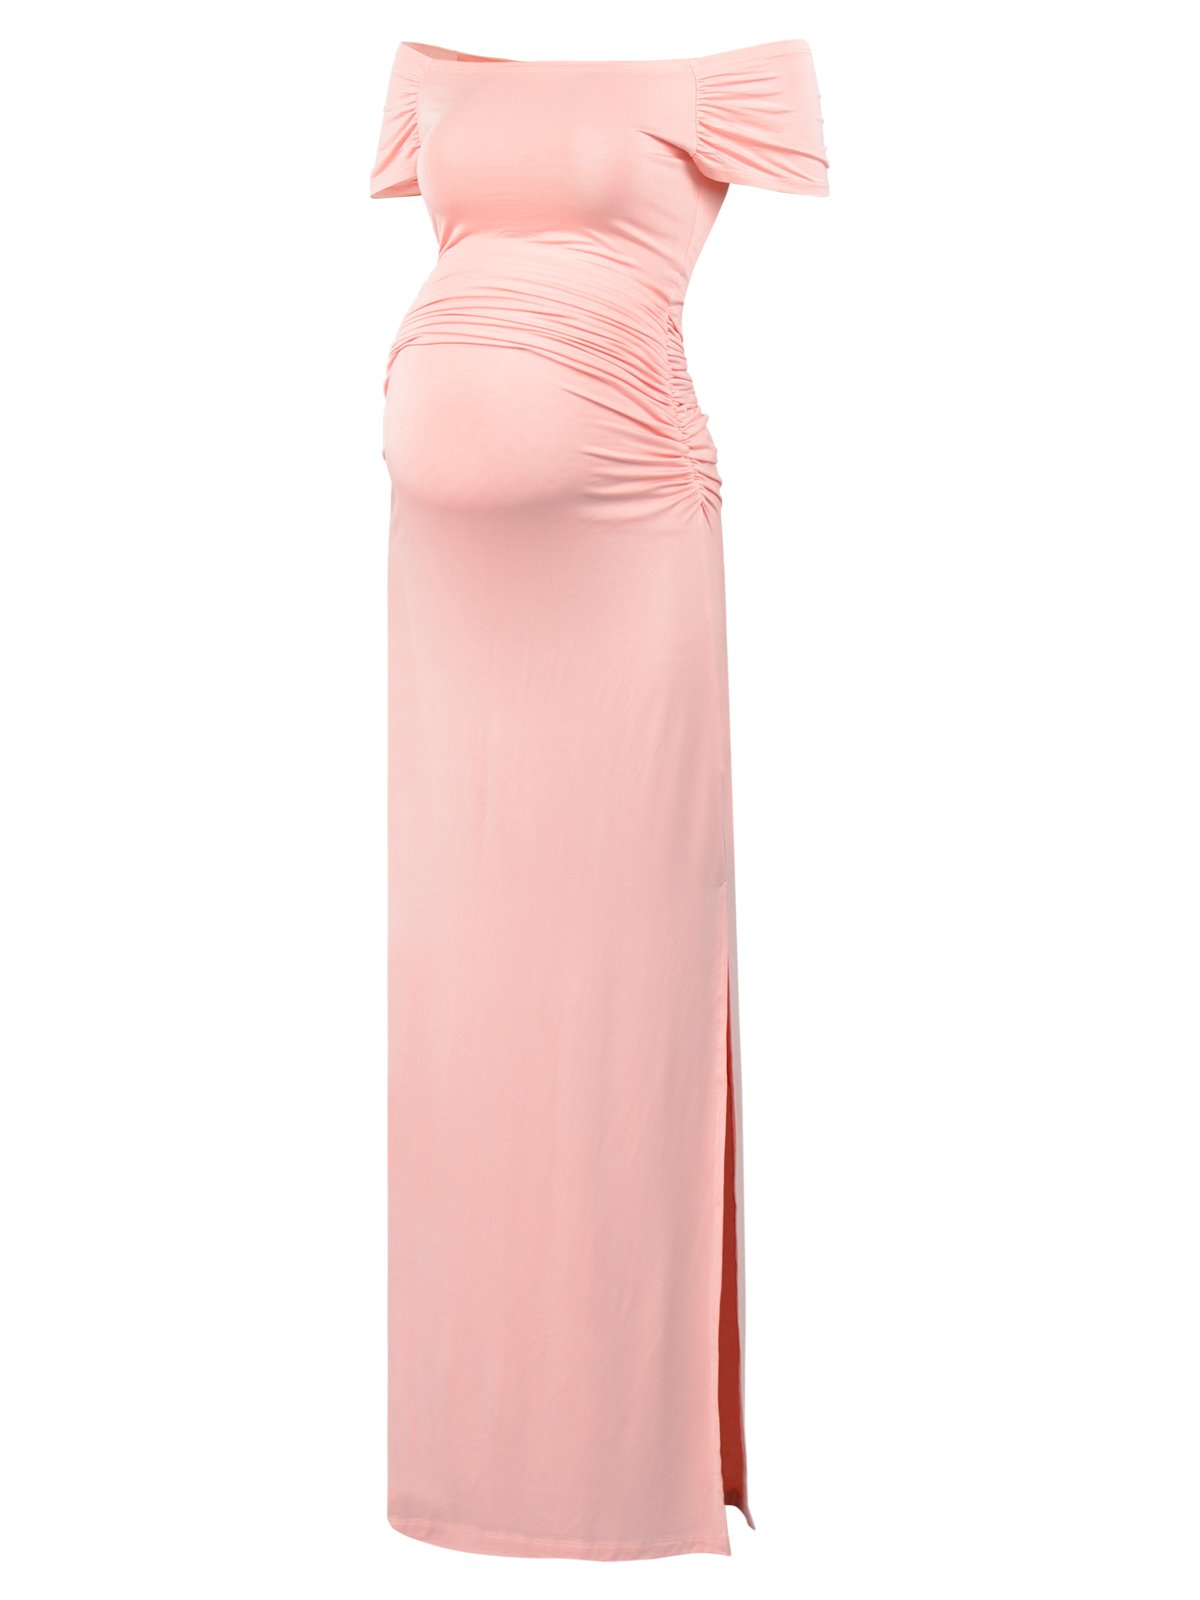 BlackCherry Women's Off Shoulder Short Sleeve Maternity Casual Maxi Dress